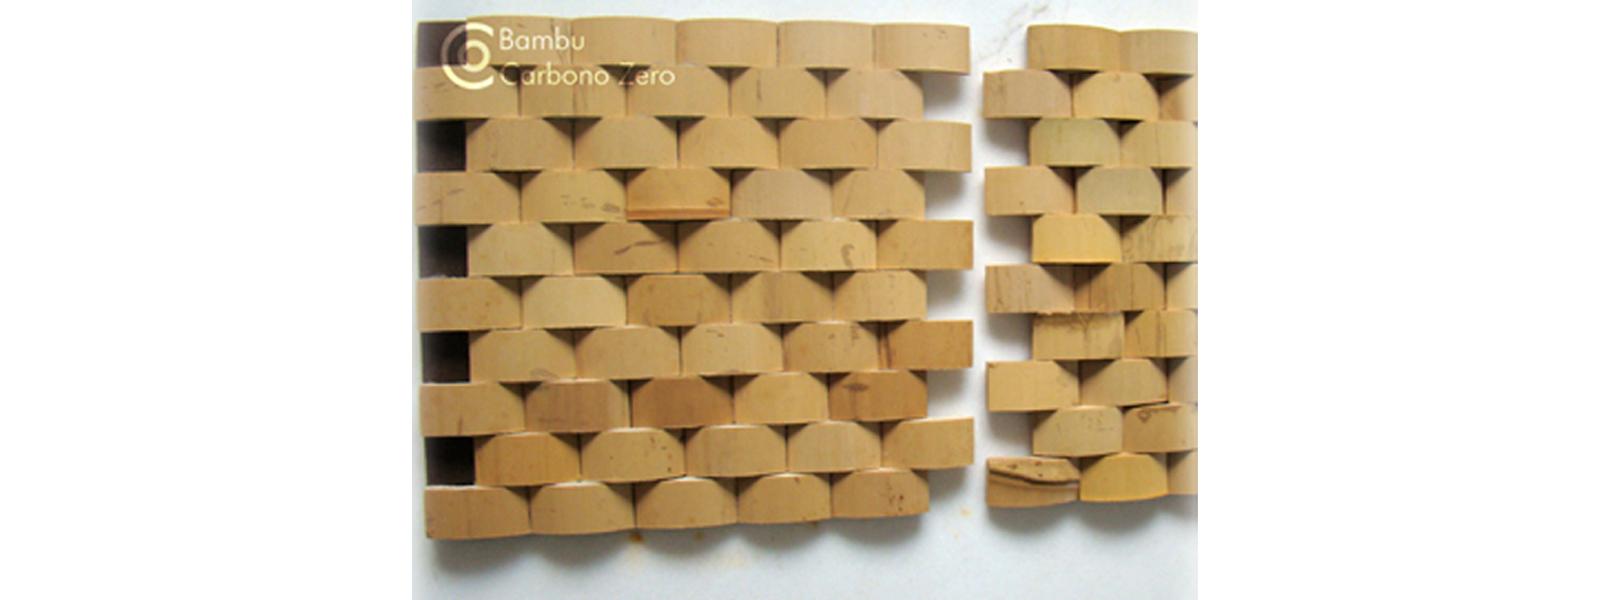 mosaico-fita-bambu